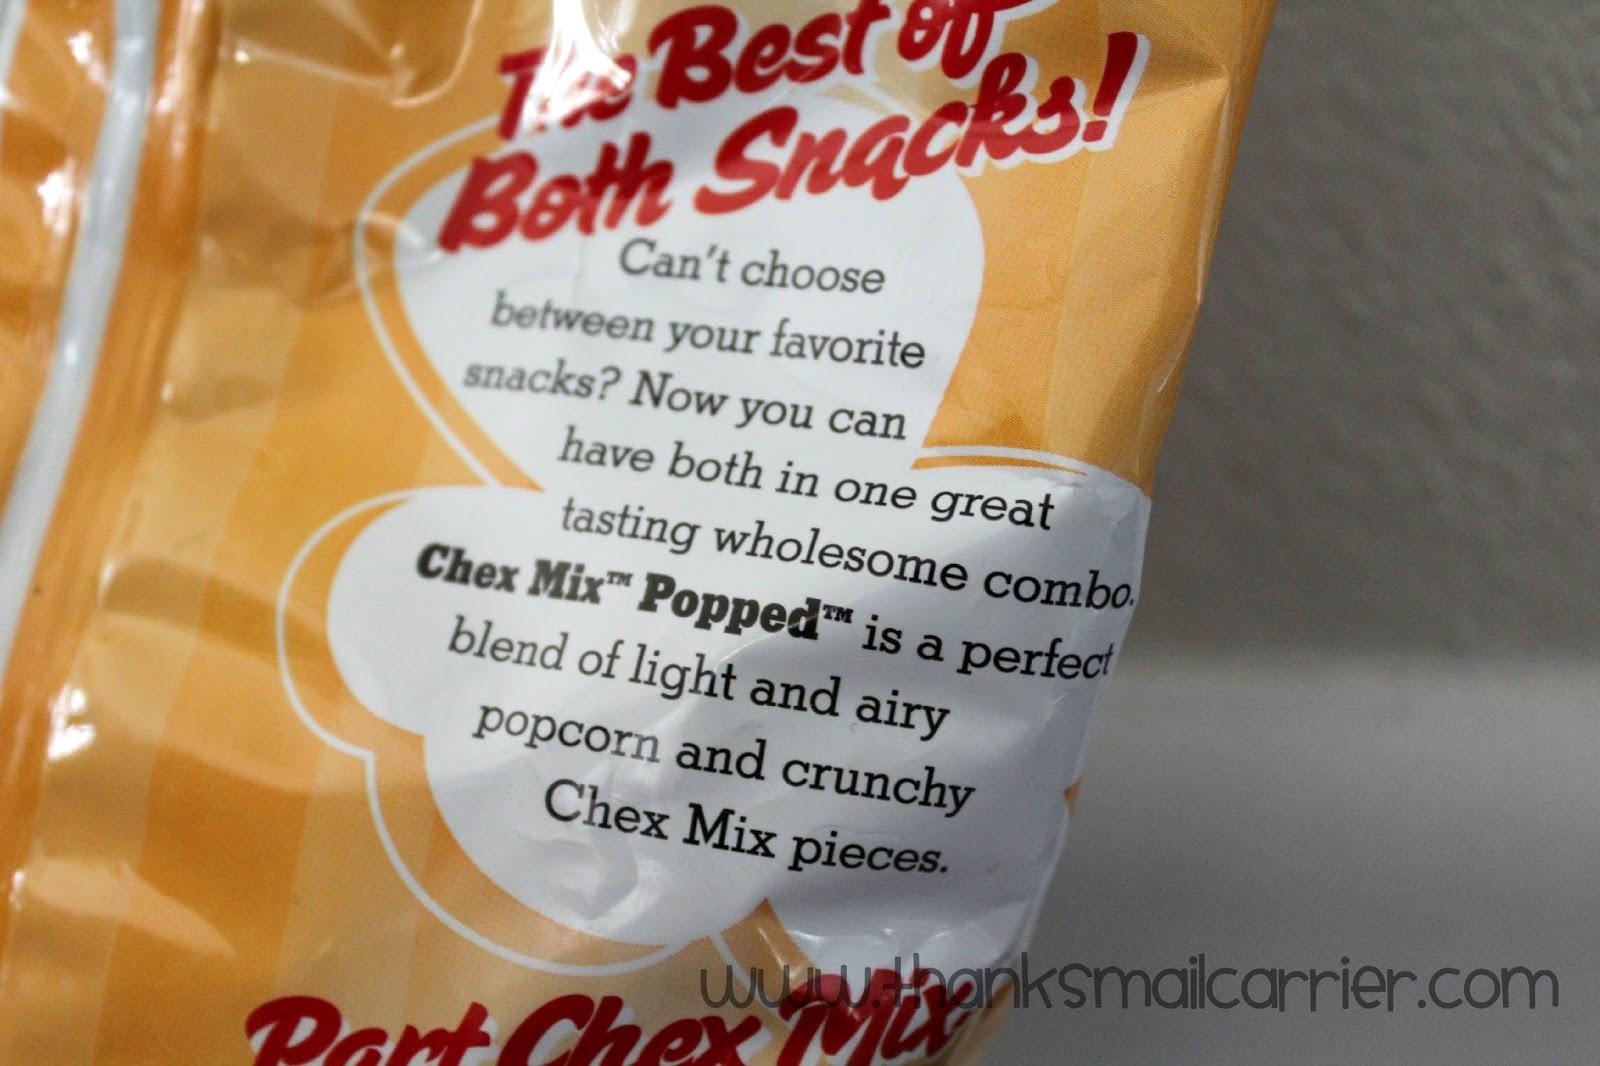 Chex Mix popcorn